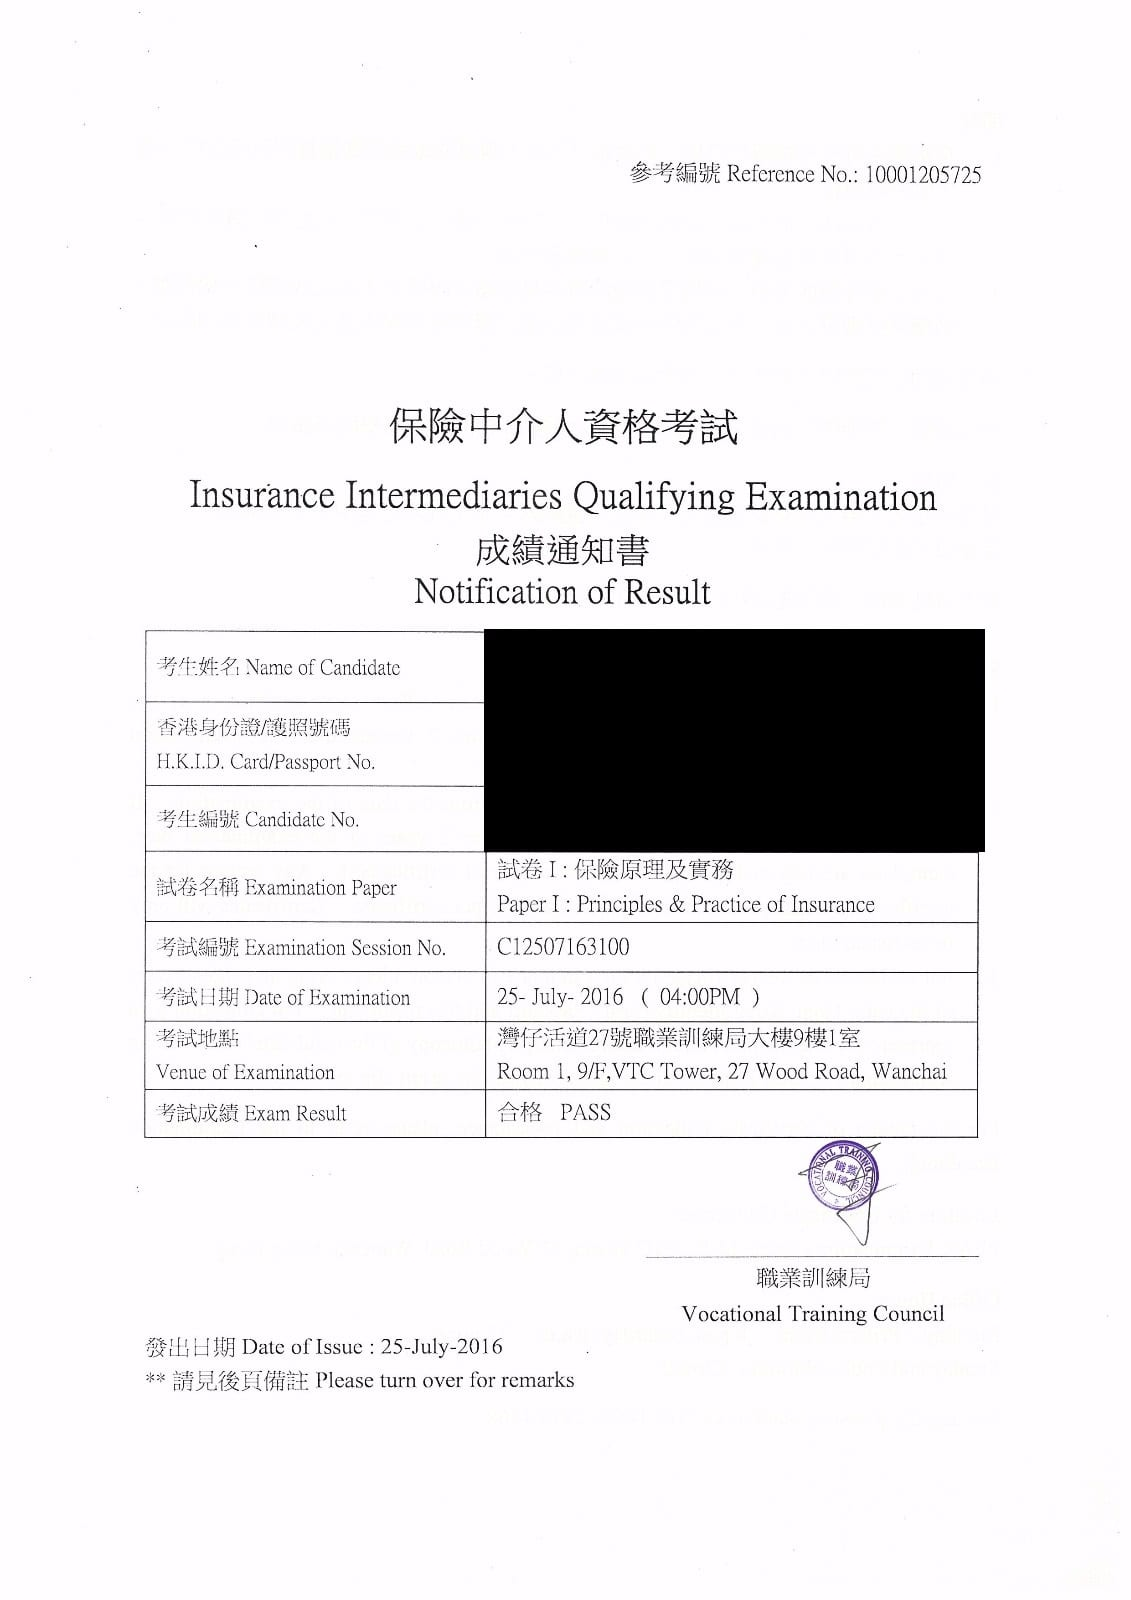 licensing examination for securities and futures intermediaries paper Hong kong securities institute 書城編號: 71641 原價: hk$25000 現售: hk$2375 節省: hk$125 (購買 10本以上 9折, 60本以上 8折) 出版社缺貨, 故不能購買 如此書日後有.